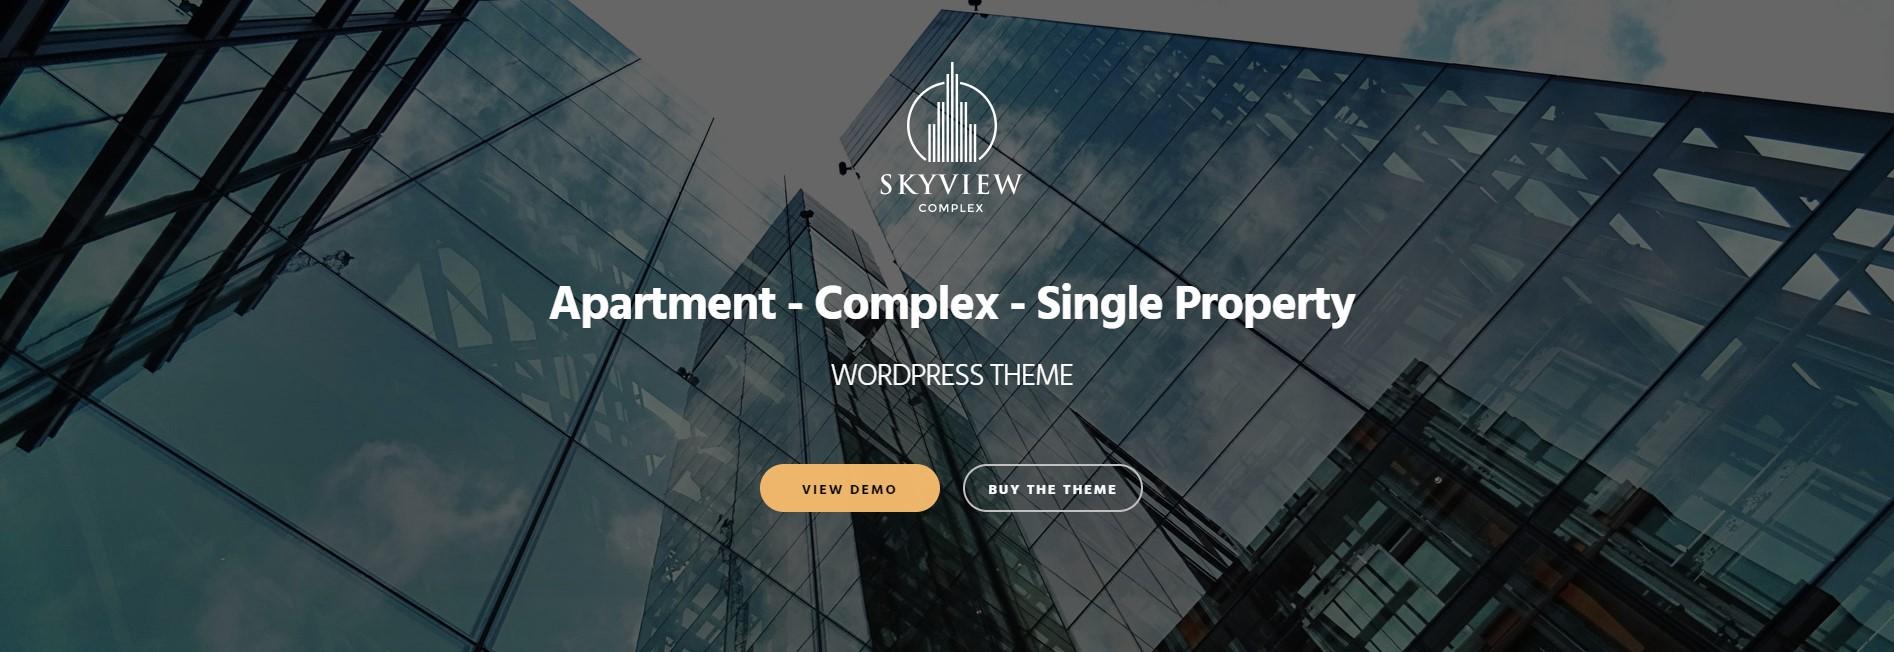 Skyview Single Property WordPress Theme